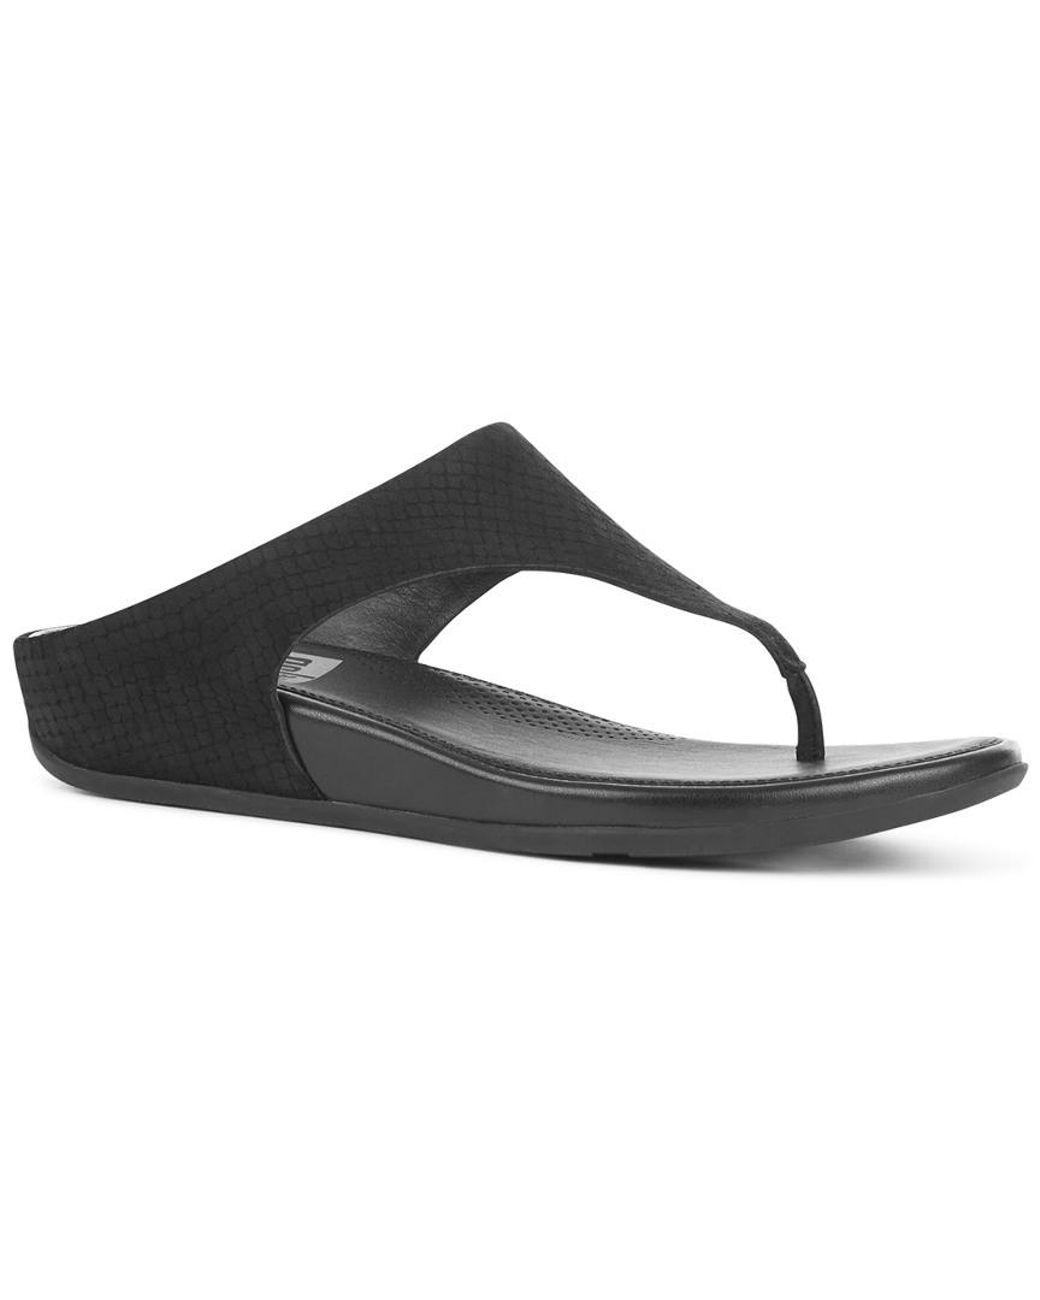 7a7d67b82 Lyst - Fitflop Banda Toe Snake Thong Sandal in Black